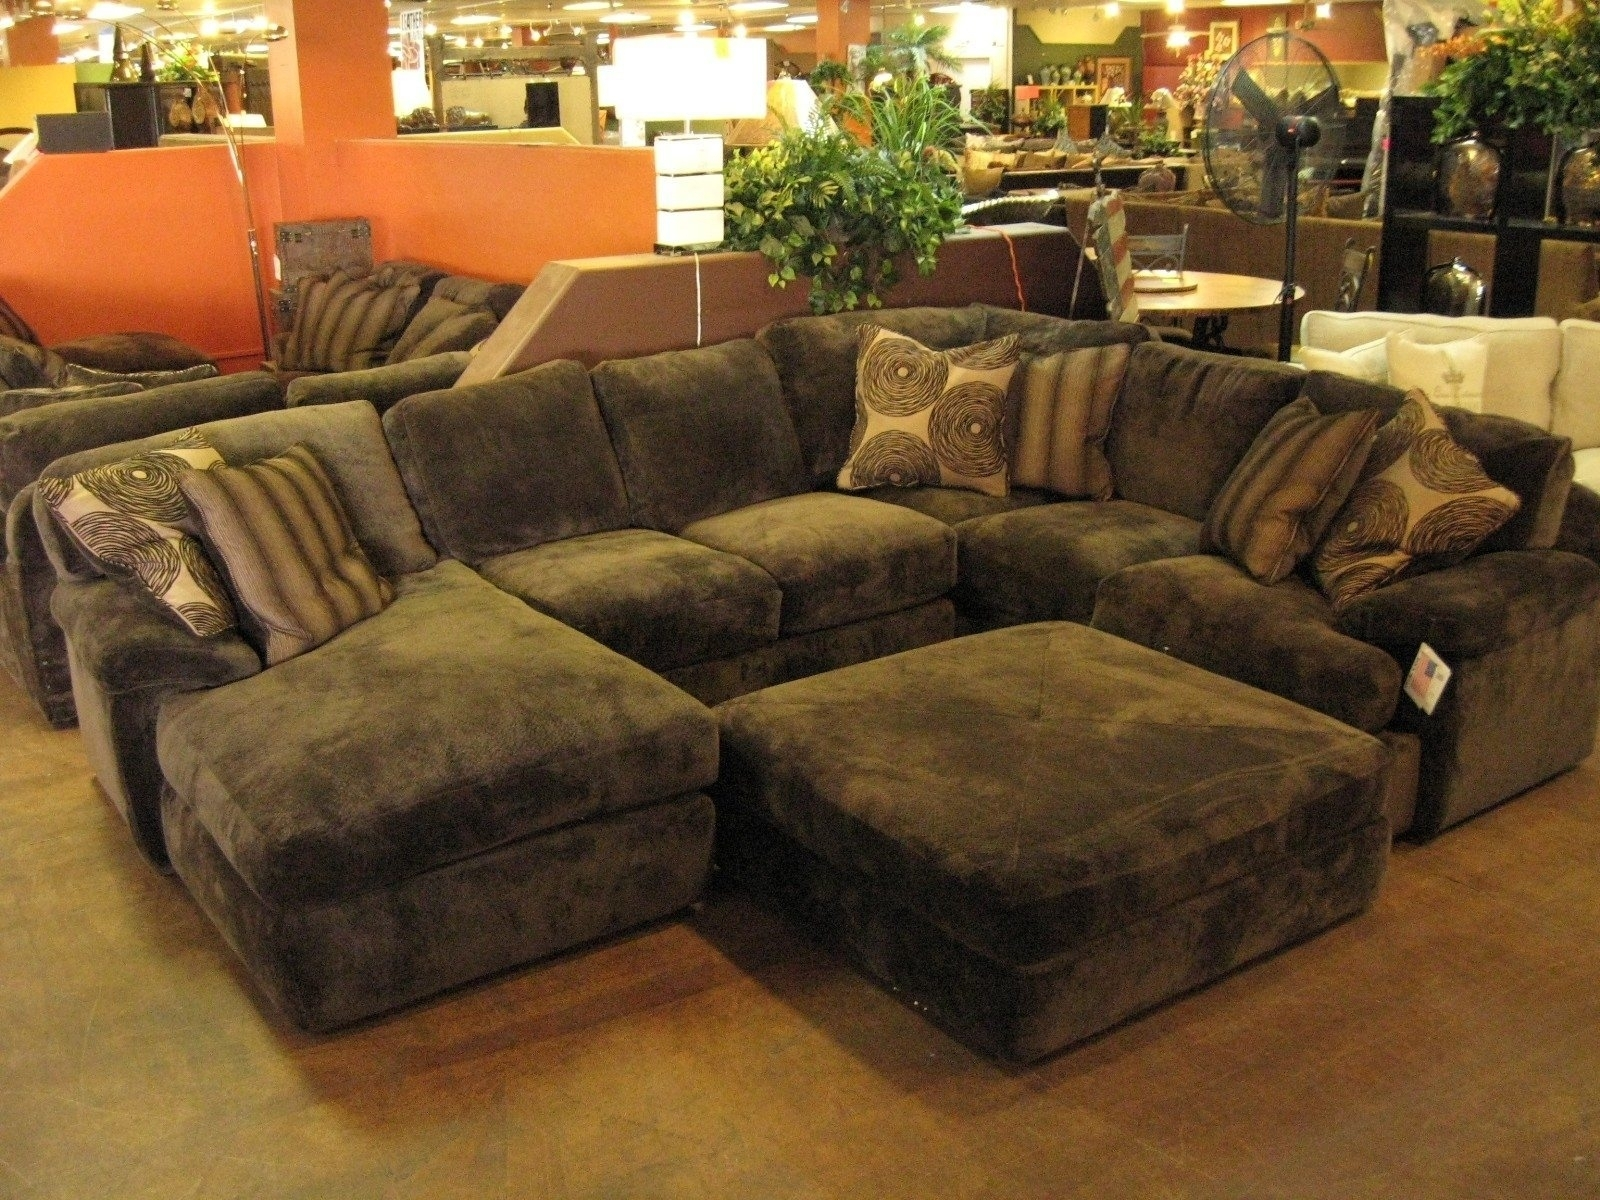 Stylish Sectional Sofa With Oversized Ottoman – Mediasupload For Sectionals With Oversized Ottoman (Image 9 of 10)